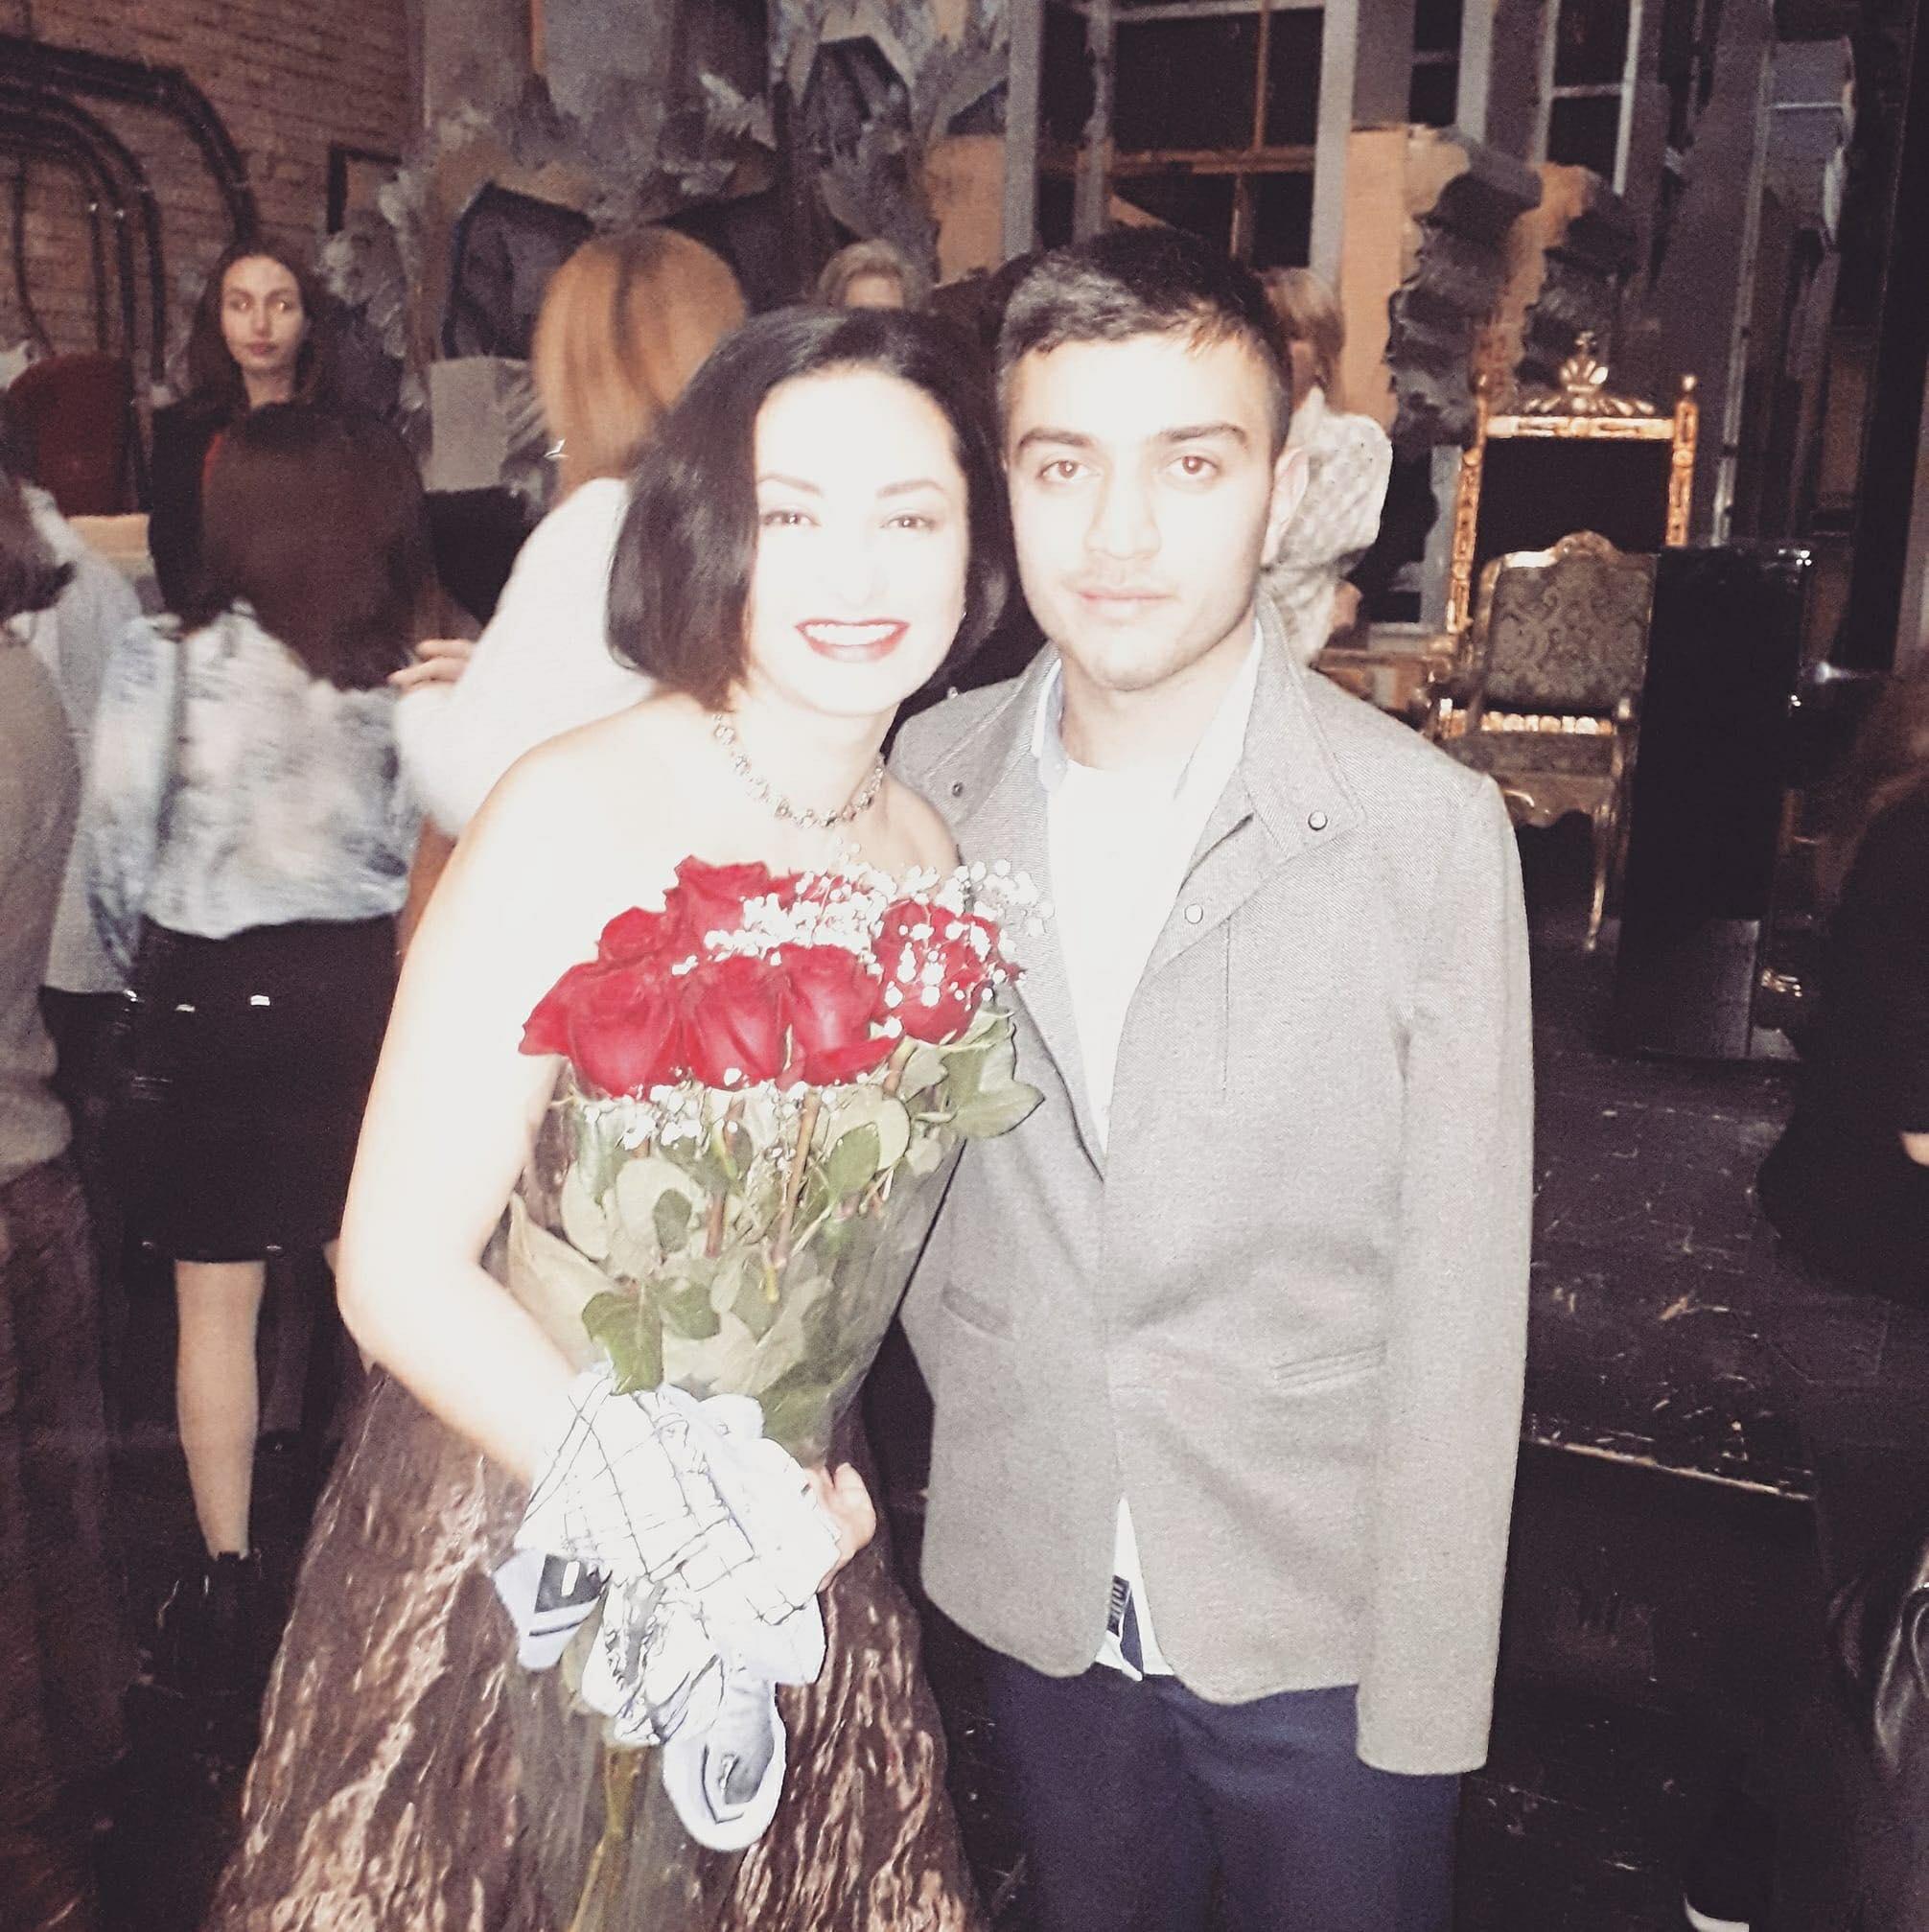 Nino Surguladze with a fan